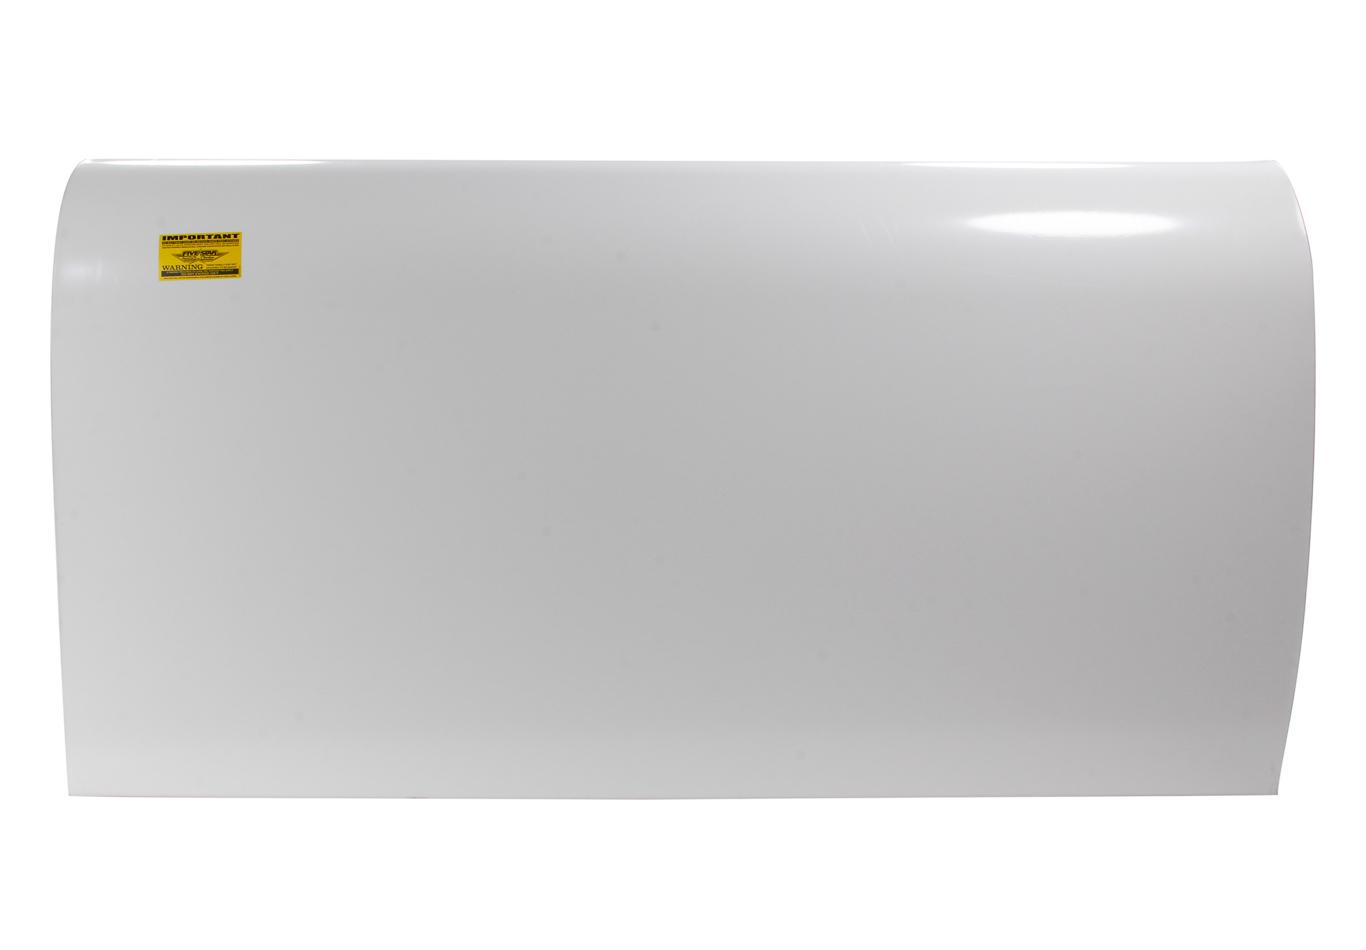 Fivestar 2019 LM Aluminum Door White Right